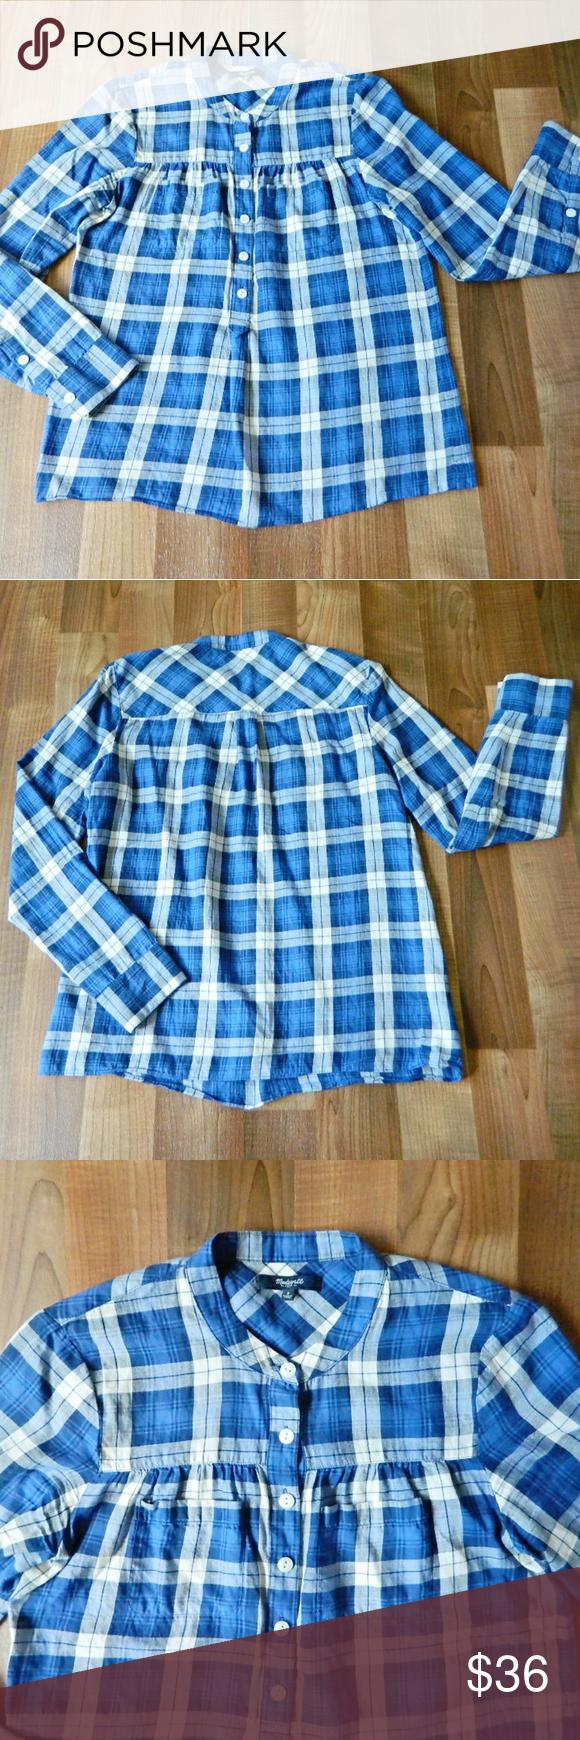 Mandarin collar flannel  Madewell Blue Plaid Mandarin Collar Button Shirt  Mandarin collar